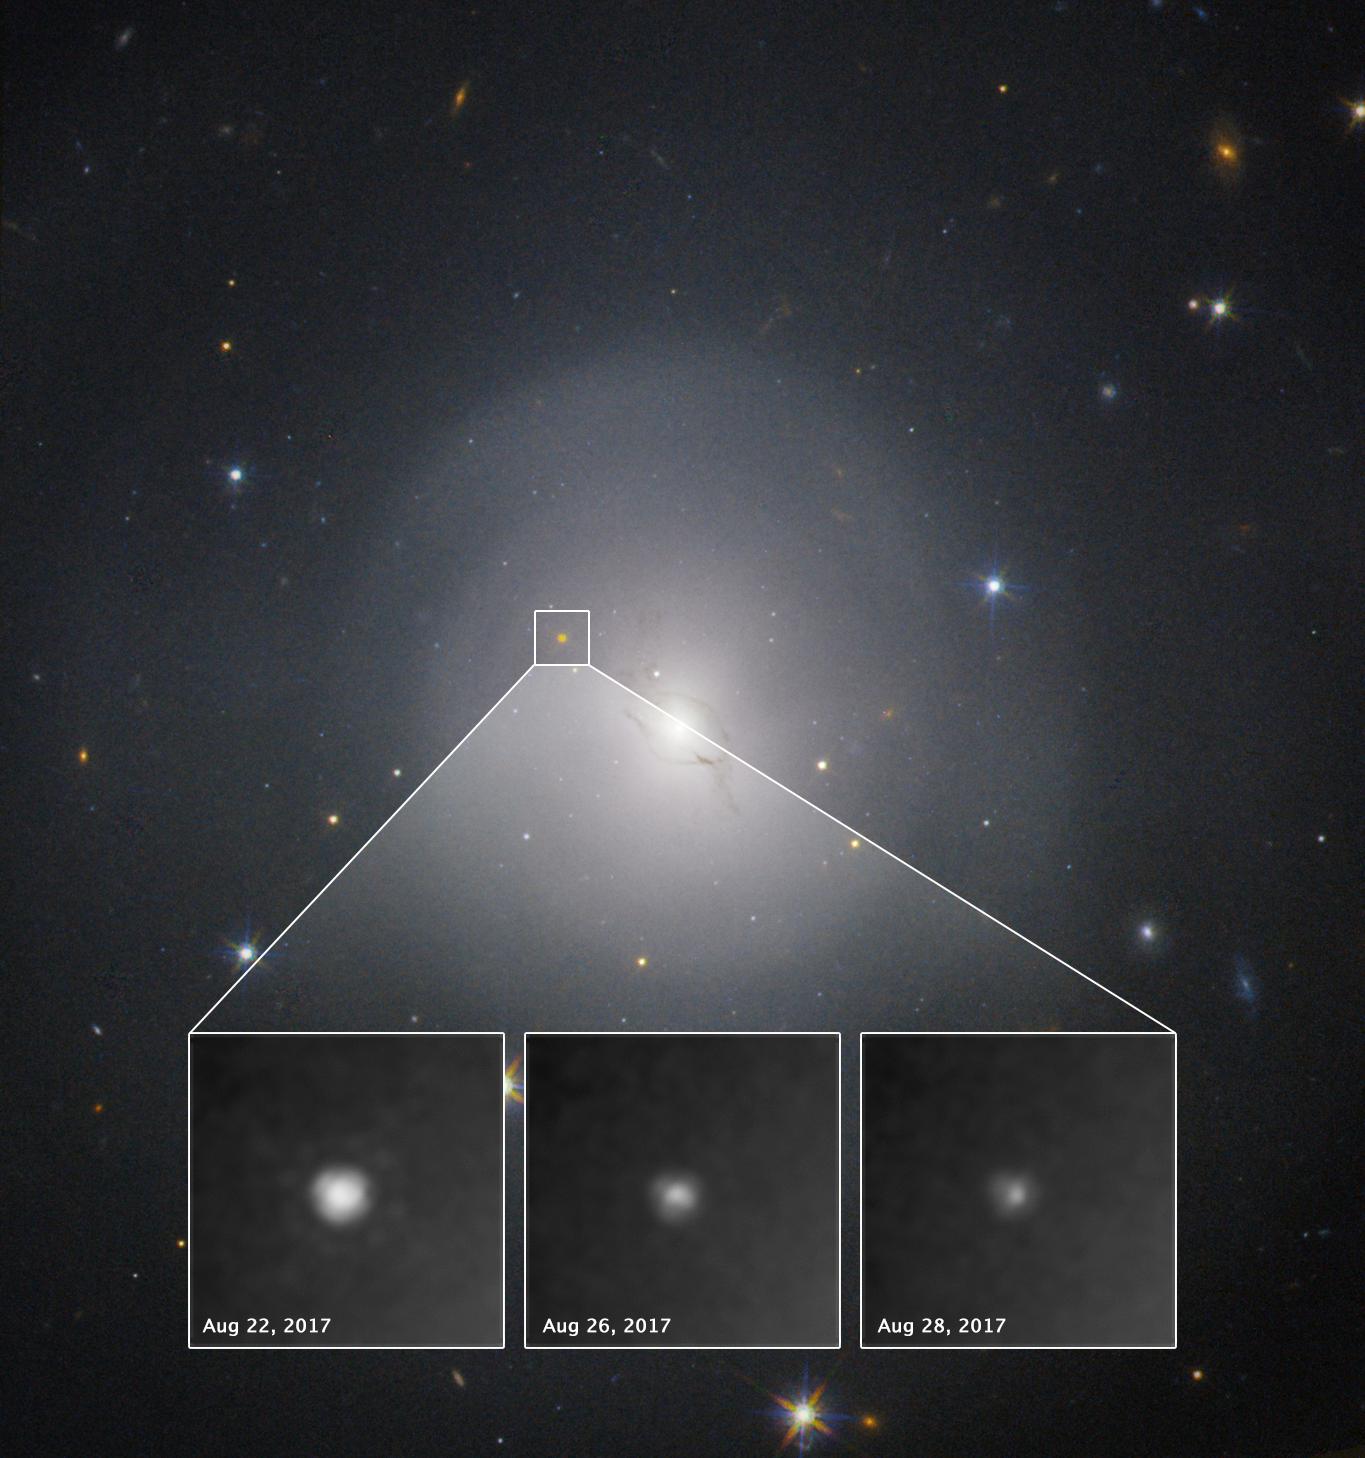 proton star nasa - photo #20